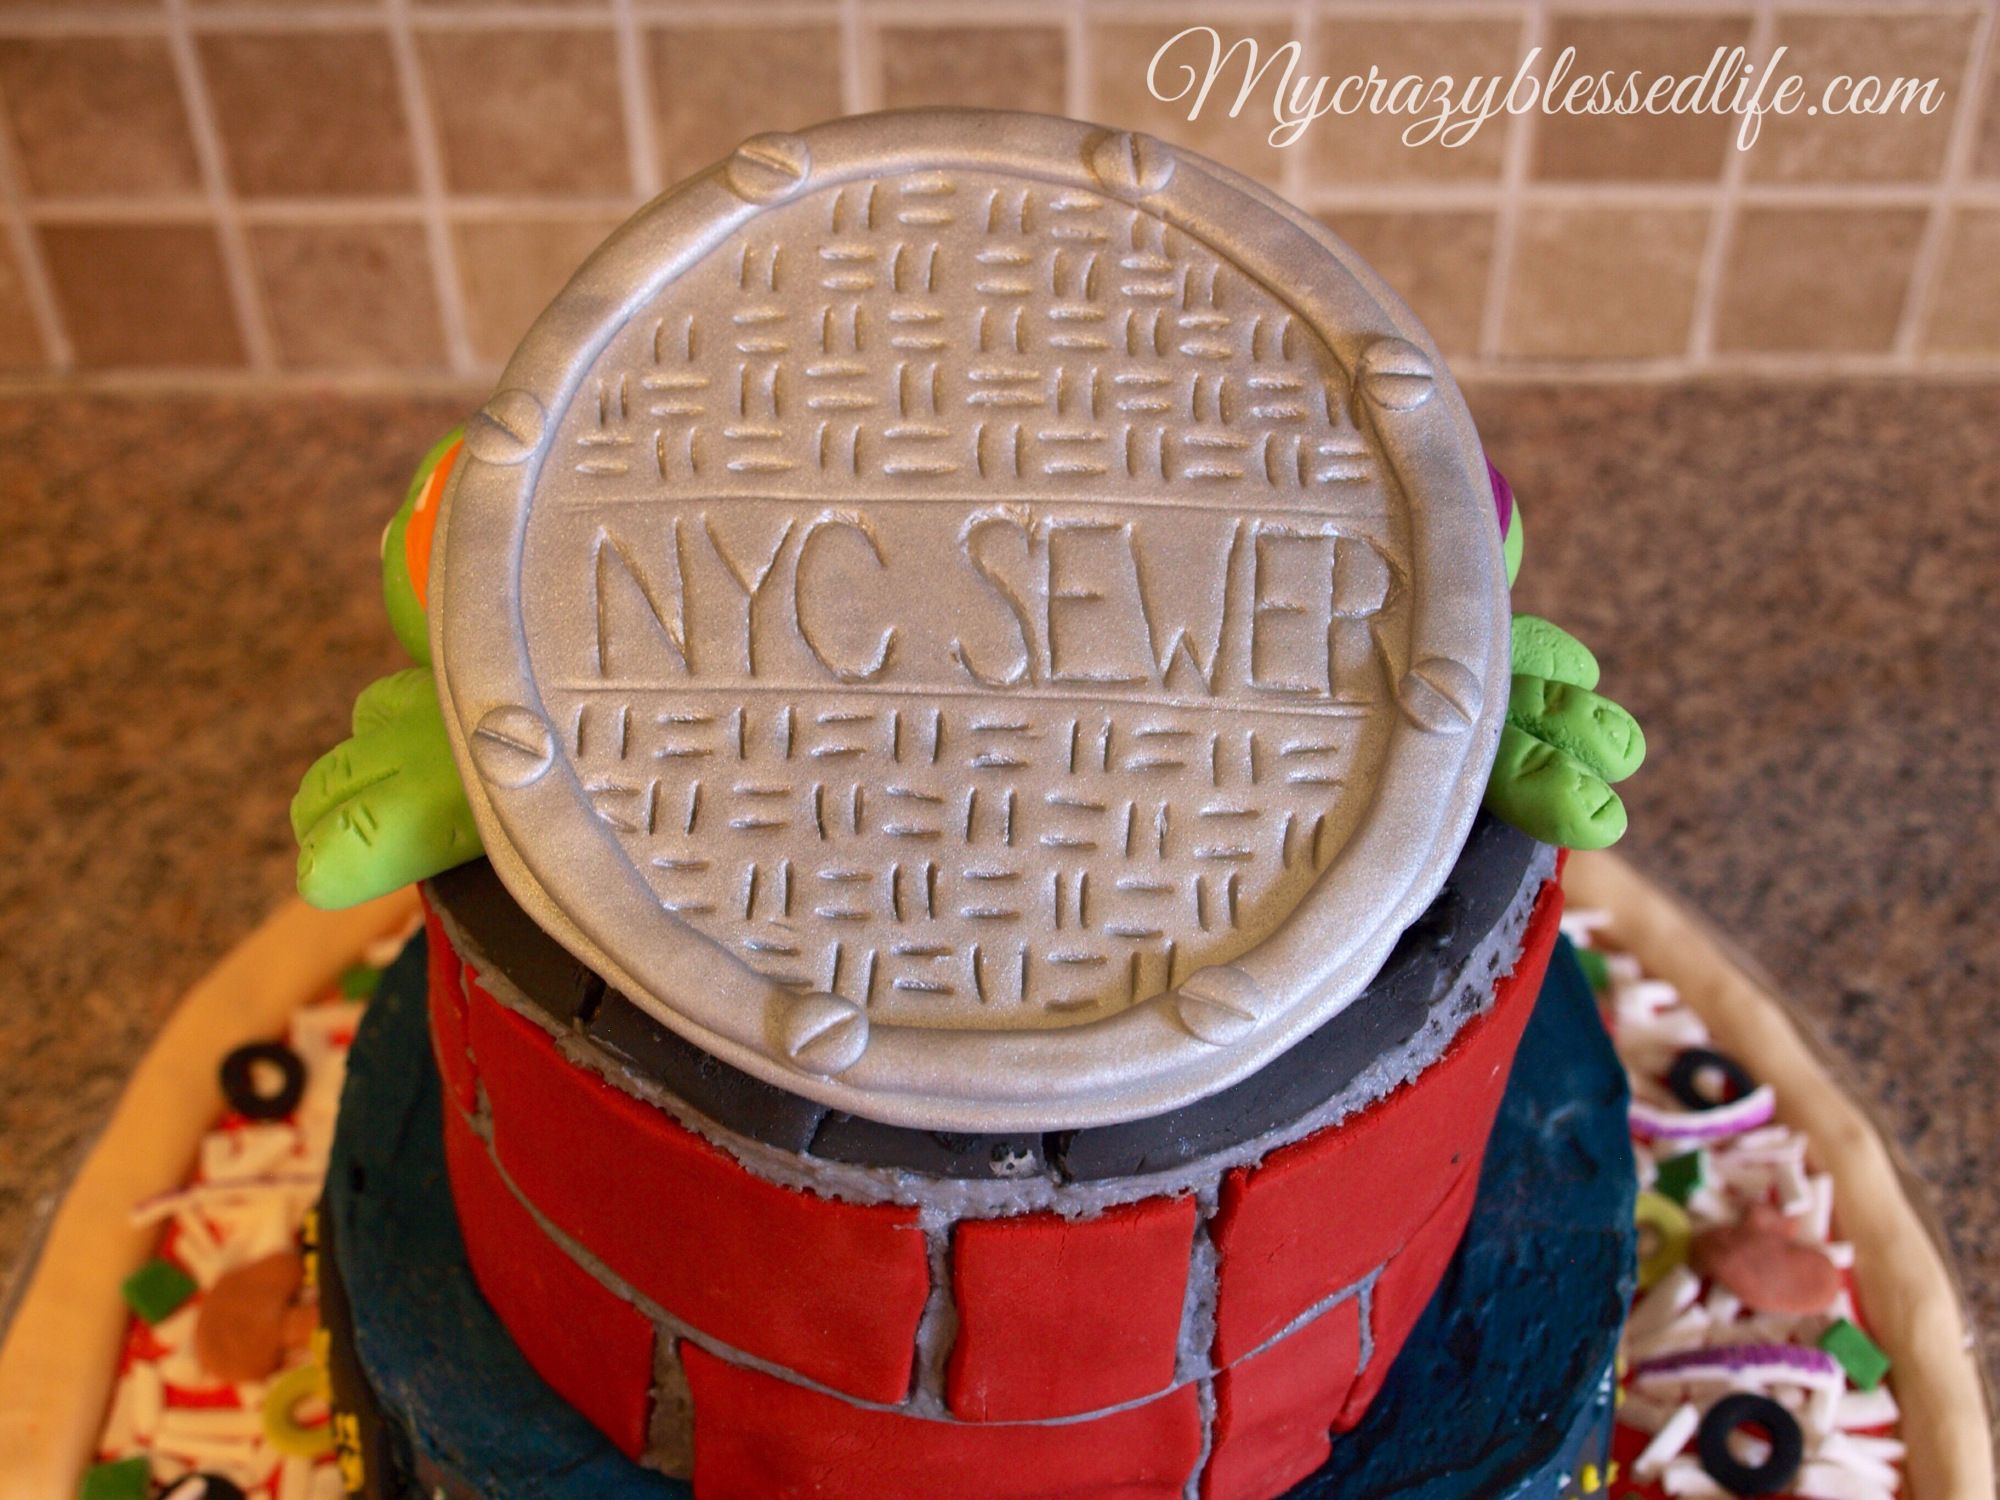 Fondant manhole cover for ninja turtle birthday cake